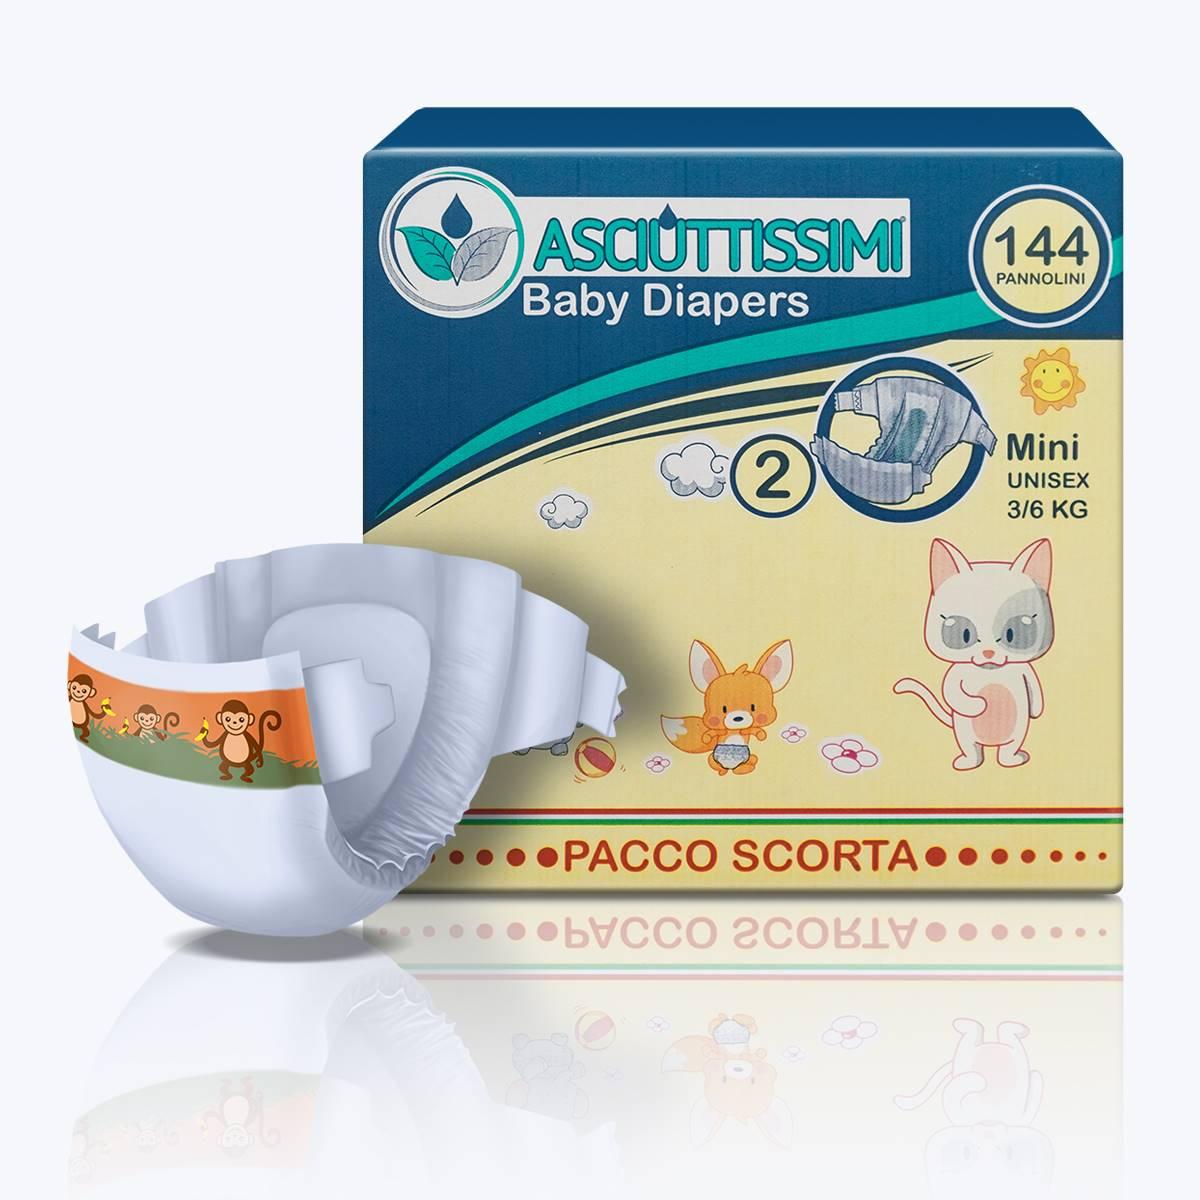 Pannolino Asciuttissimi Baby – tg. 2 (3-6kg) - pacco scorta (144pz)